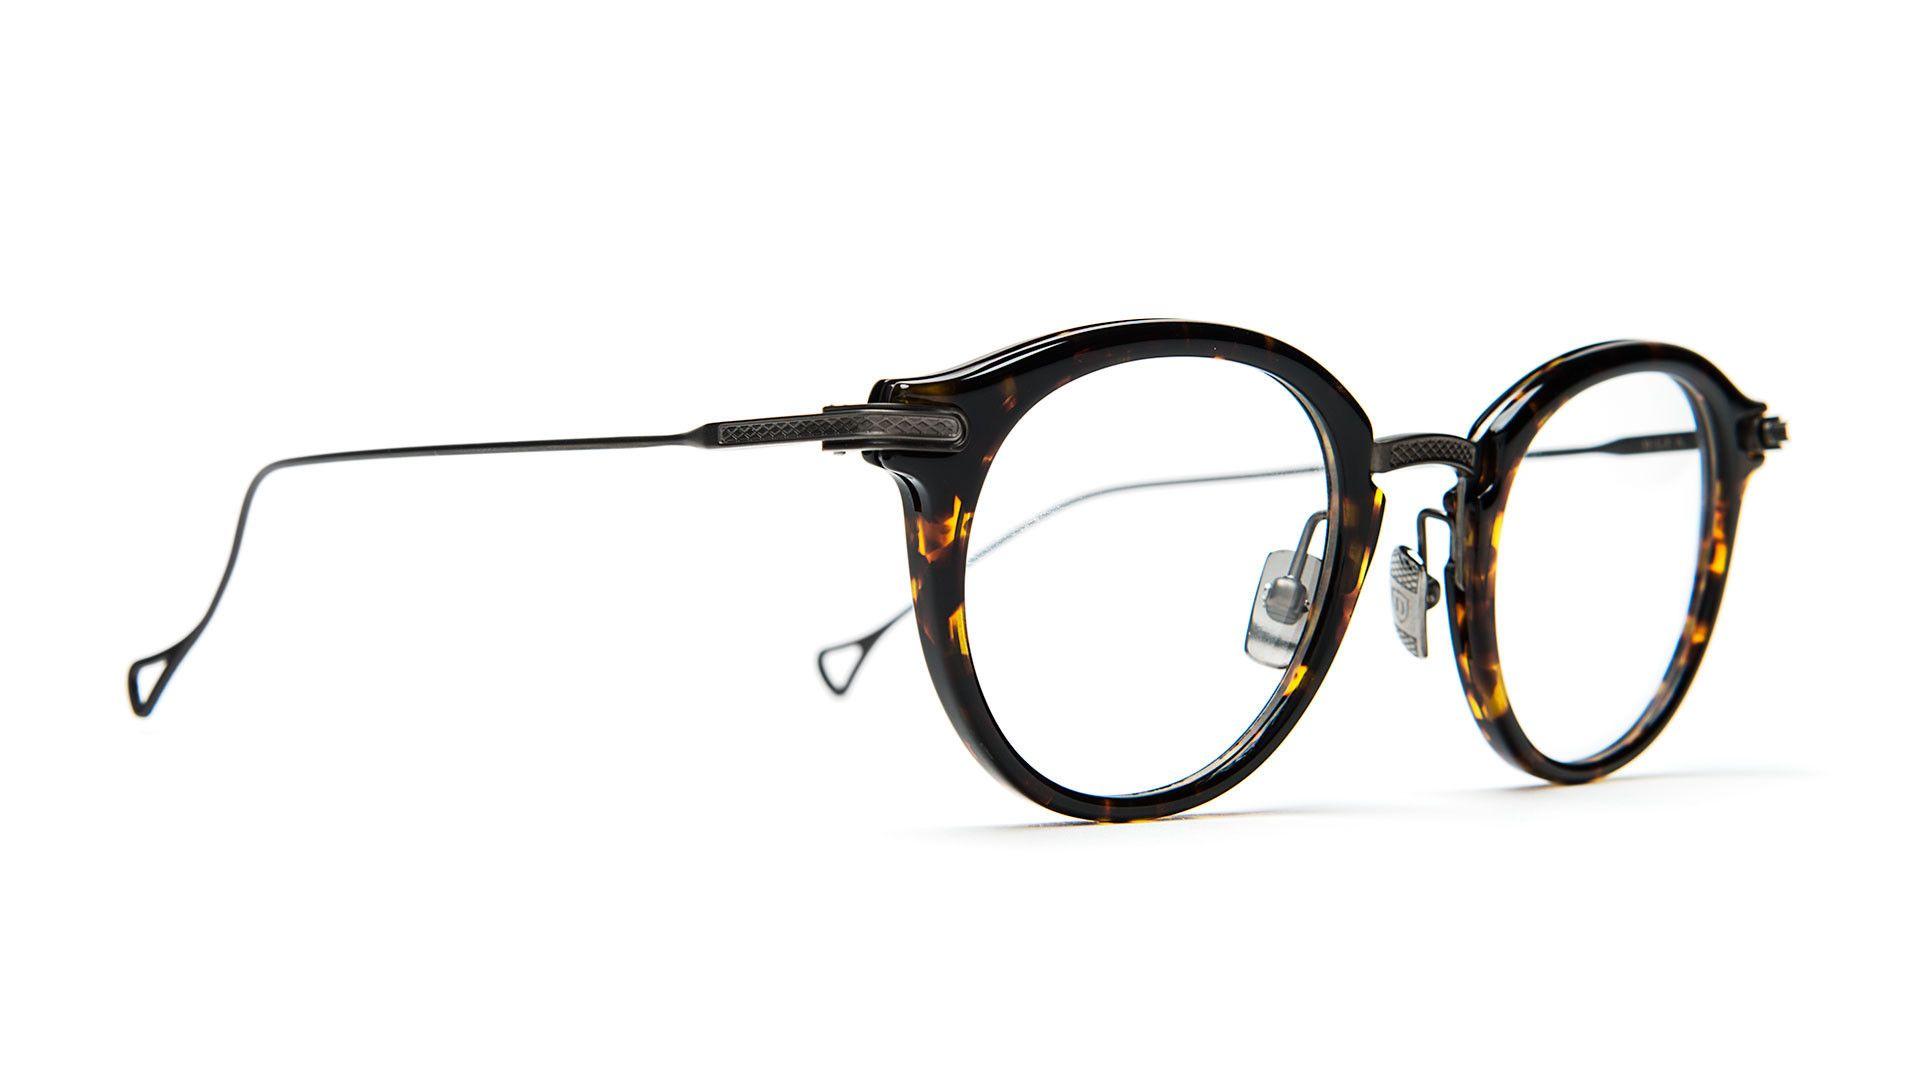 EDMONT- Dark Tortoise / Gunmetal #blackoptical #dita #ditaeyewear #glasses